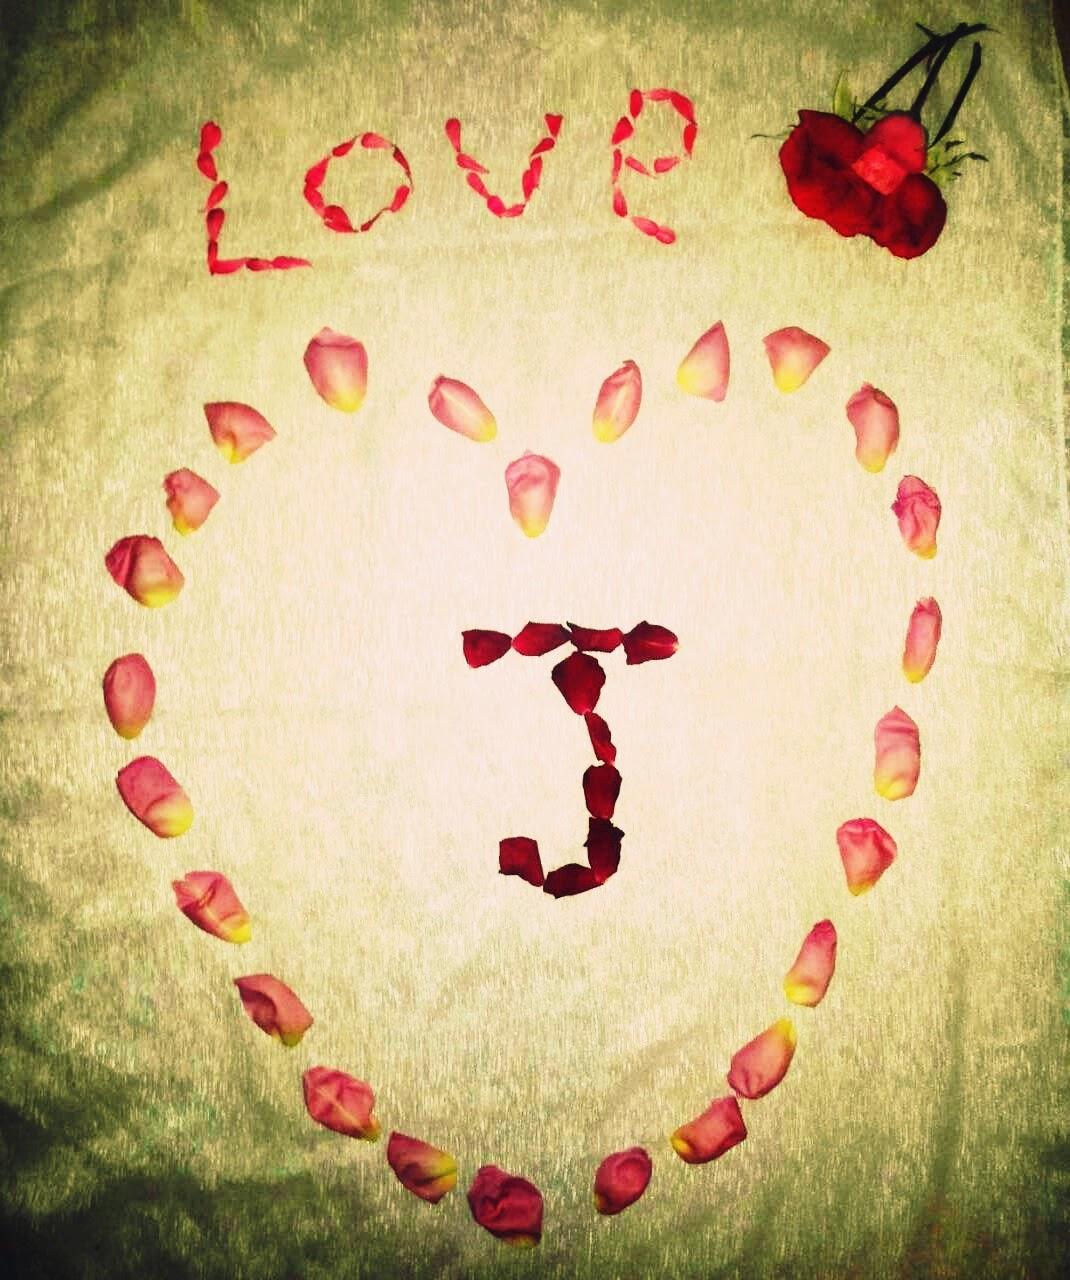 صورة صور حب حرف j , شاهد اجمل الاسماء بحرف j